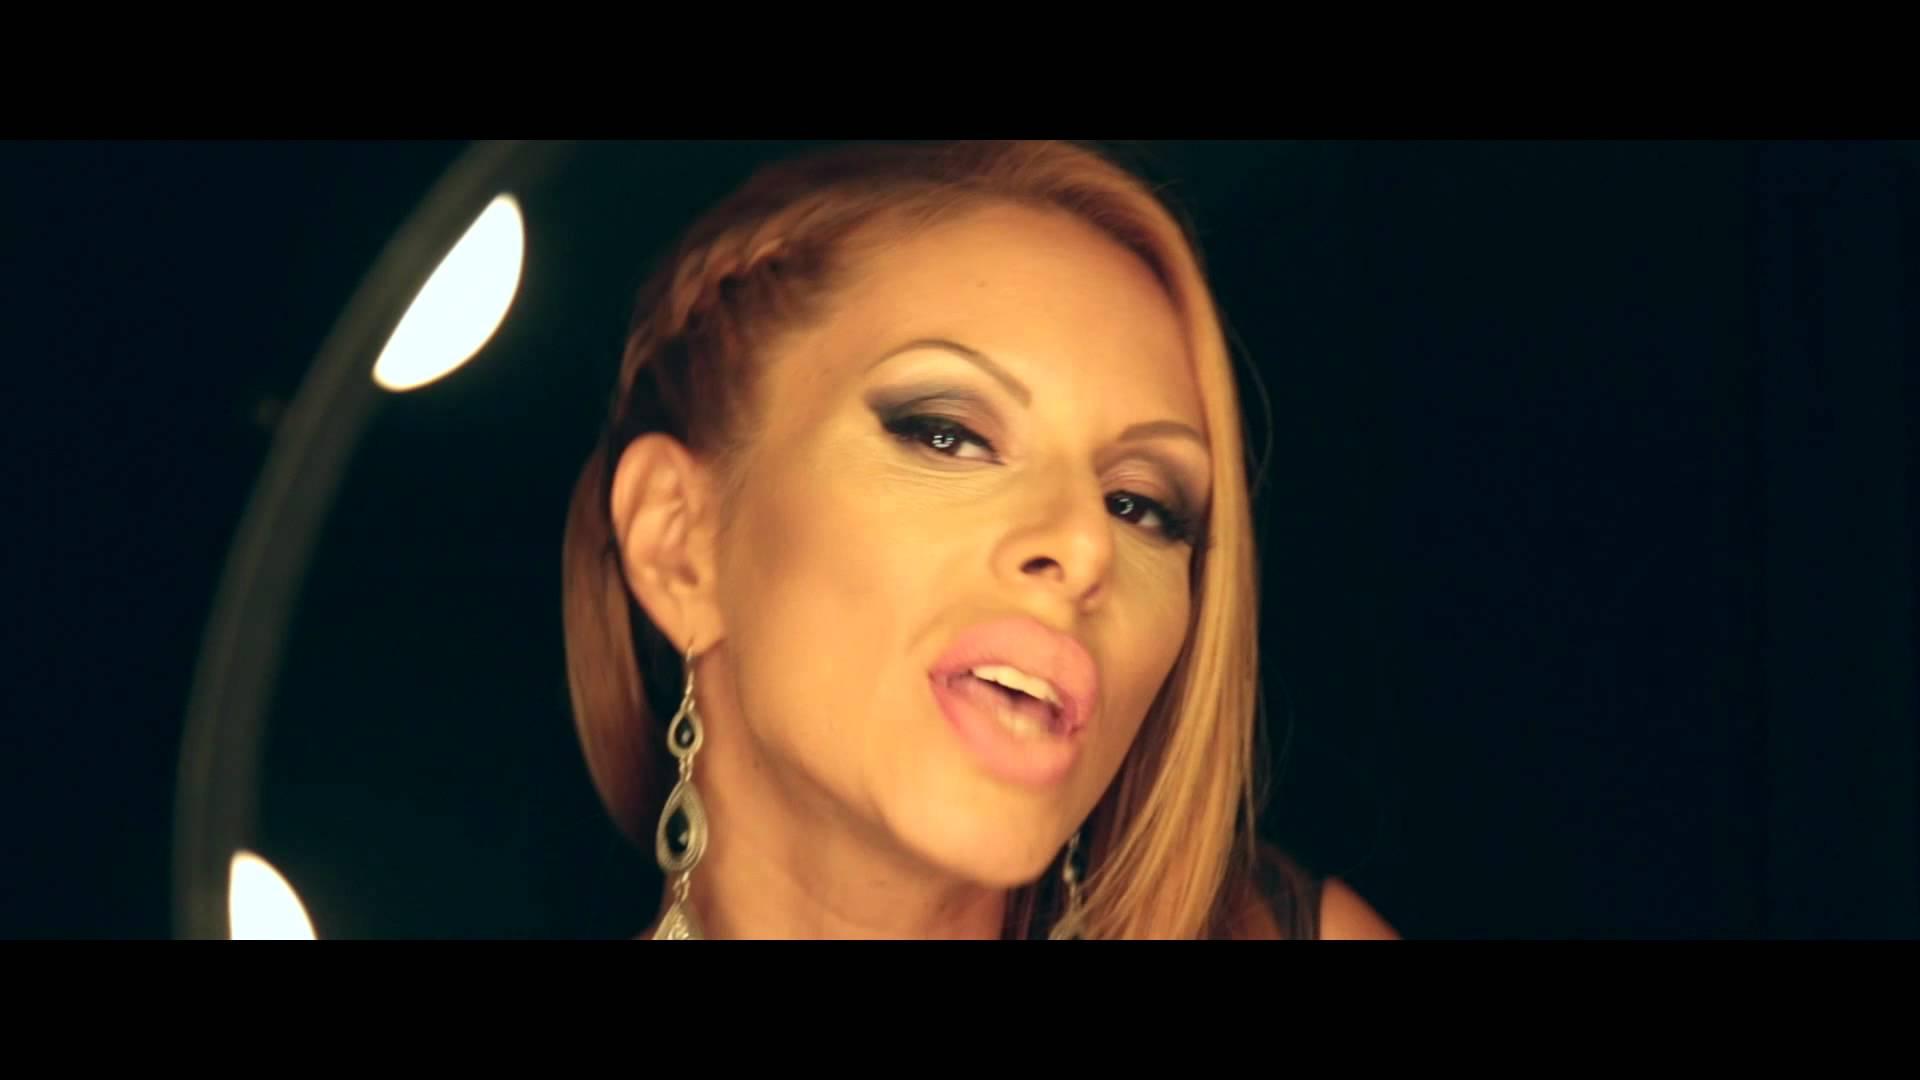 DaddyCold feat. Tamara Radmilovic - 2015 - Sad Me Ljubi (Extended Version)